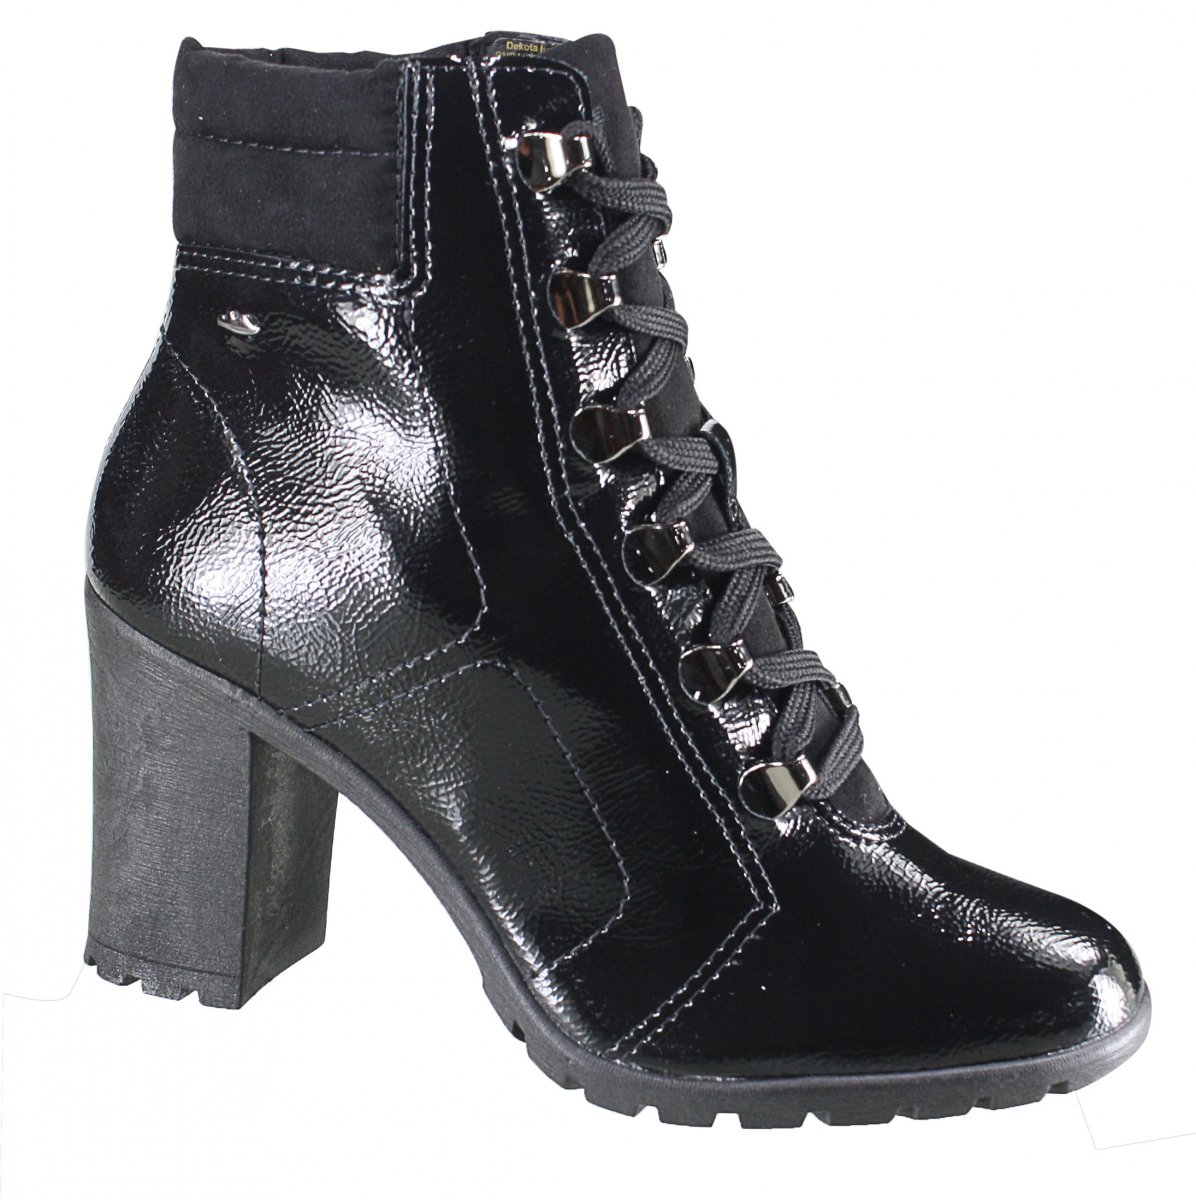 ea8c873c6 Bota Dakota Ankle Boot Feminina G1261 0009 - Preto (Follow/Nitra ...